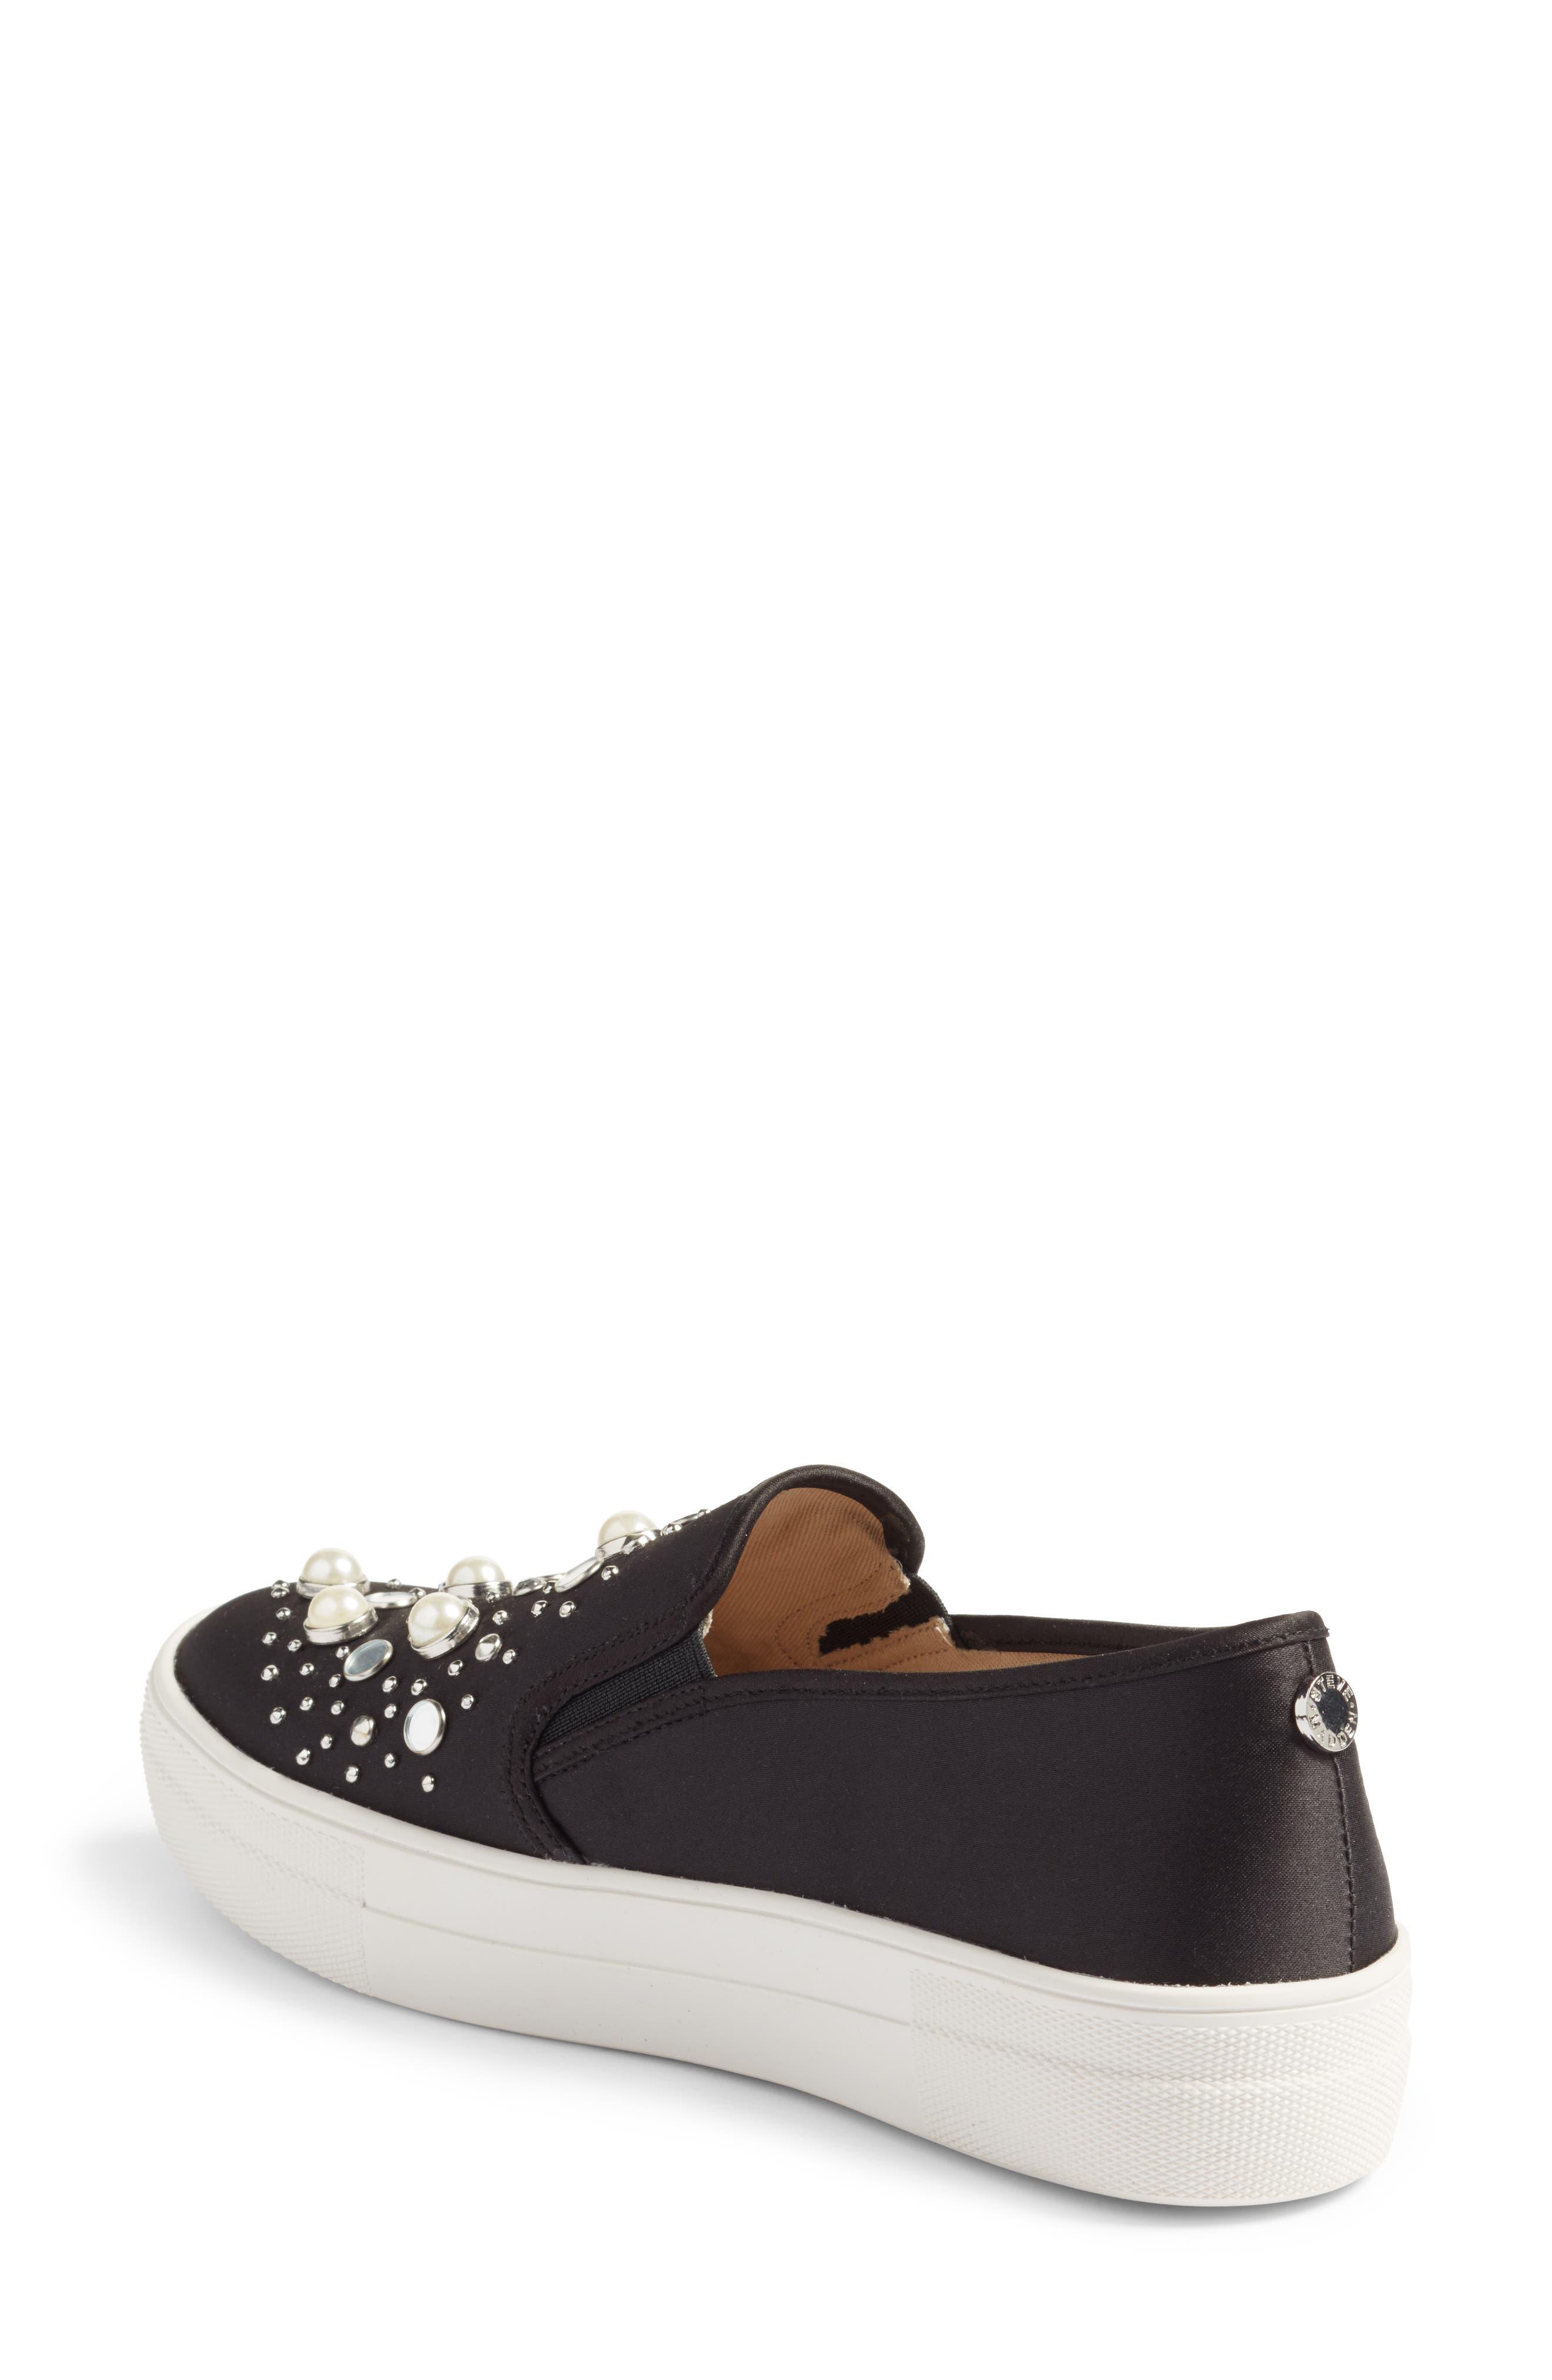 Glade Embellished Slip-On Sneaker,                             Alternate thumbnail 2, color,                             001